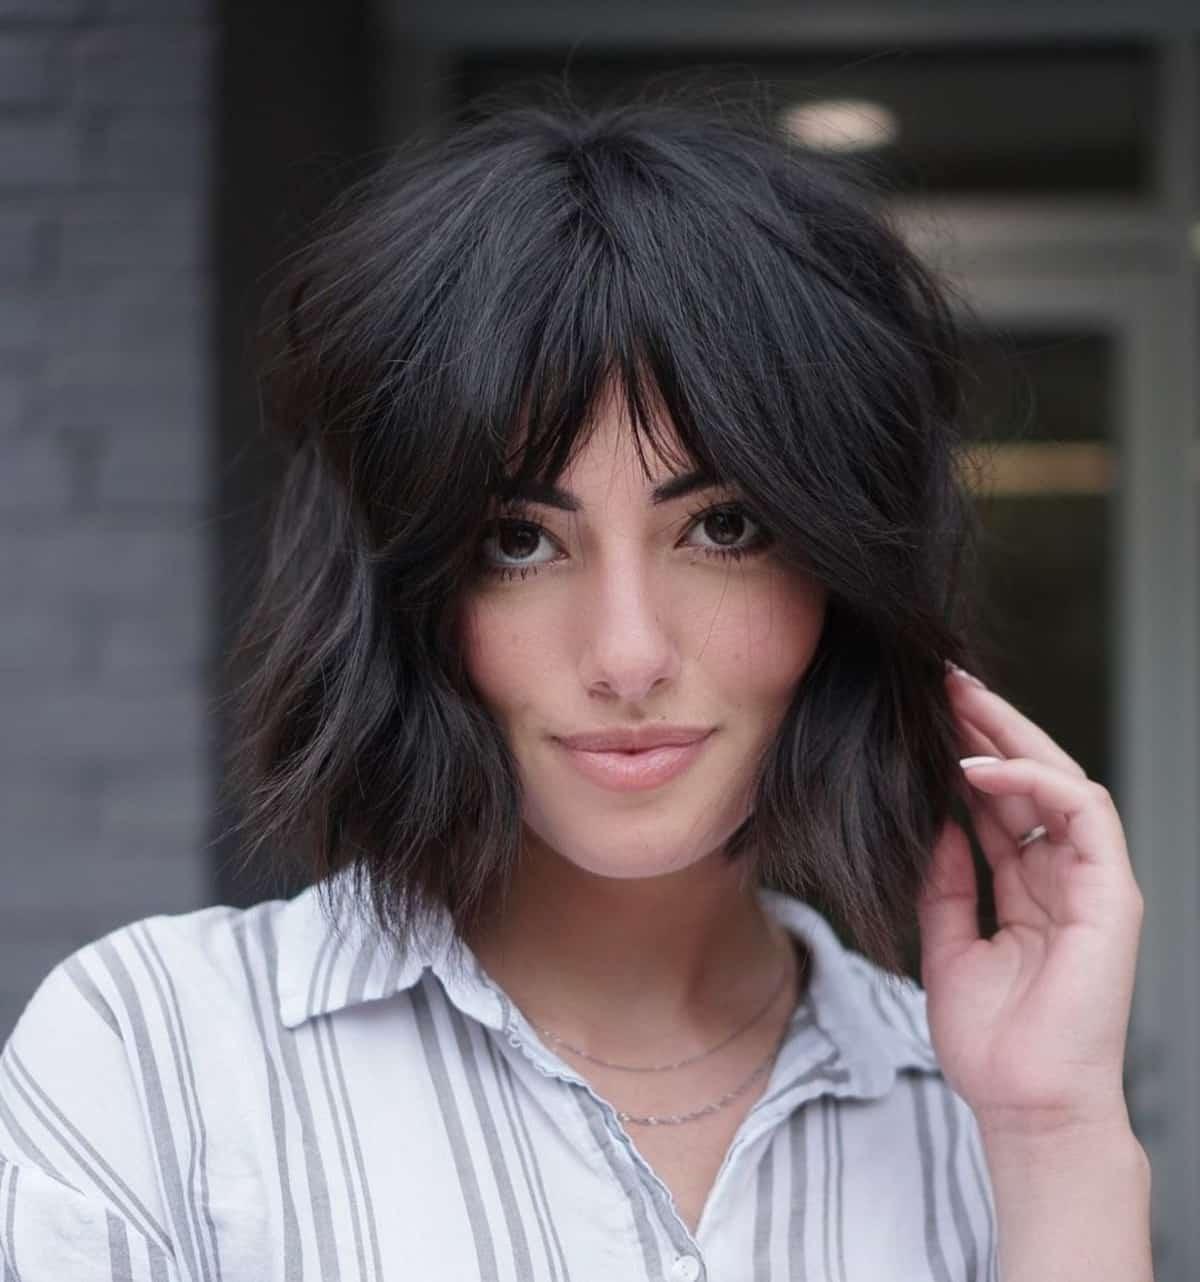 18 Bob with Curtain Bangs Hairstyle Ideas for Modern, Beachy Women